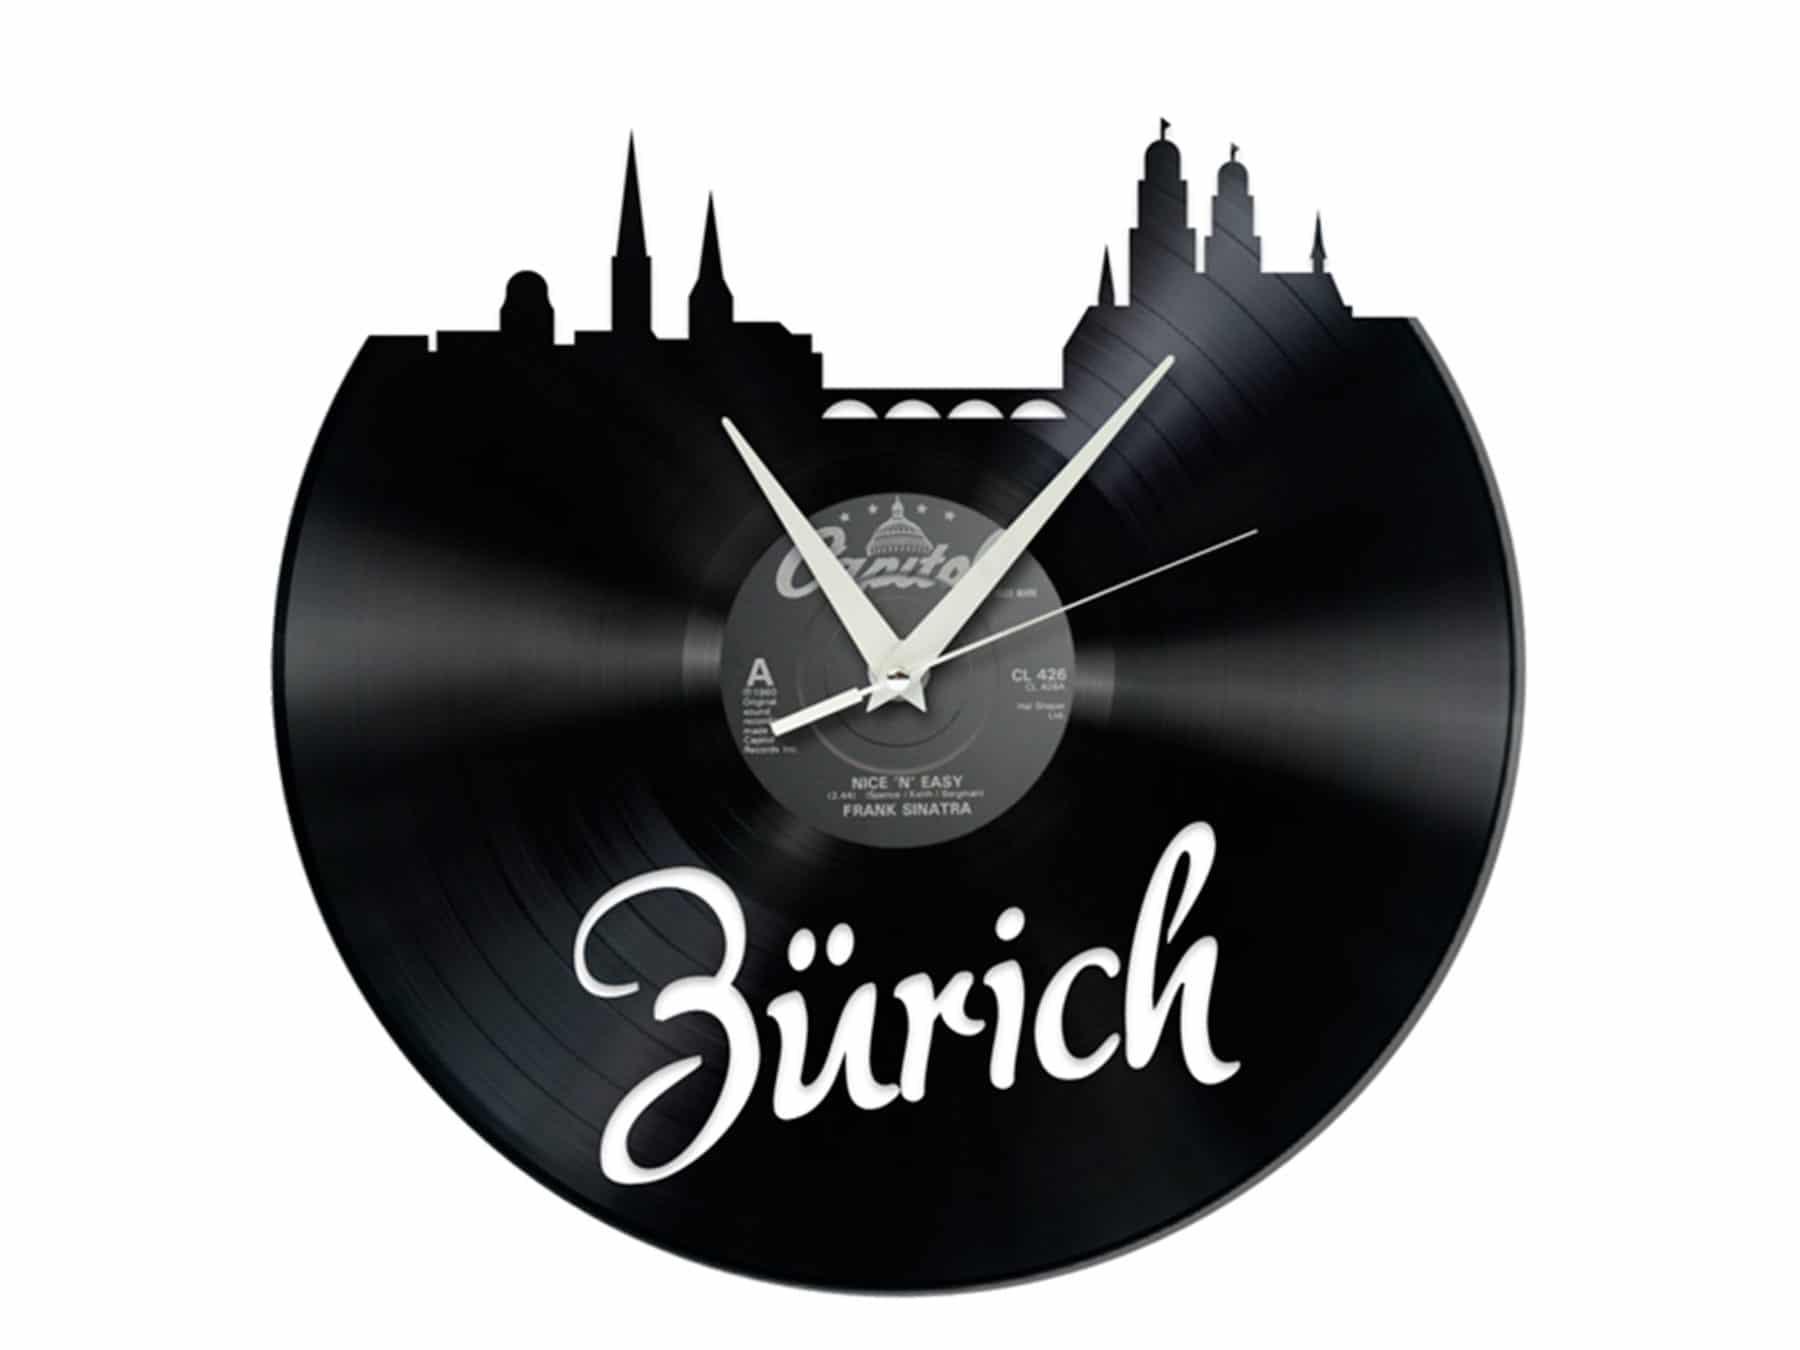 Schallplattenuhr Zürich Schweiz Upcycling Recycling KURTS.ch